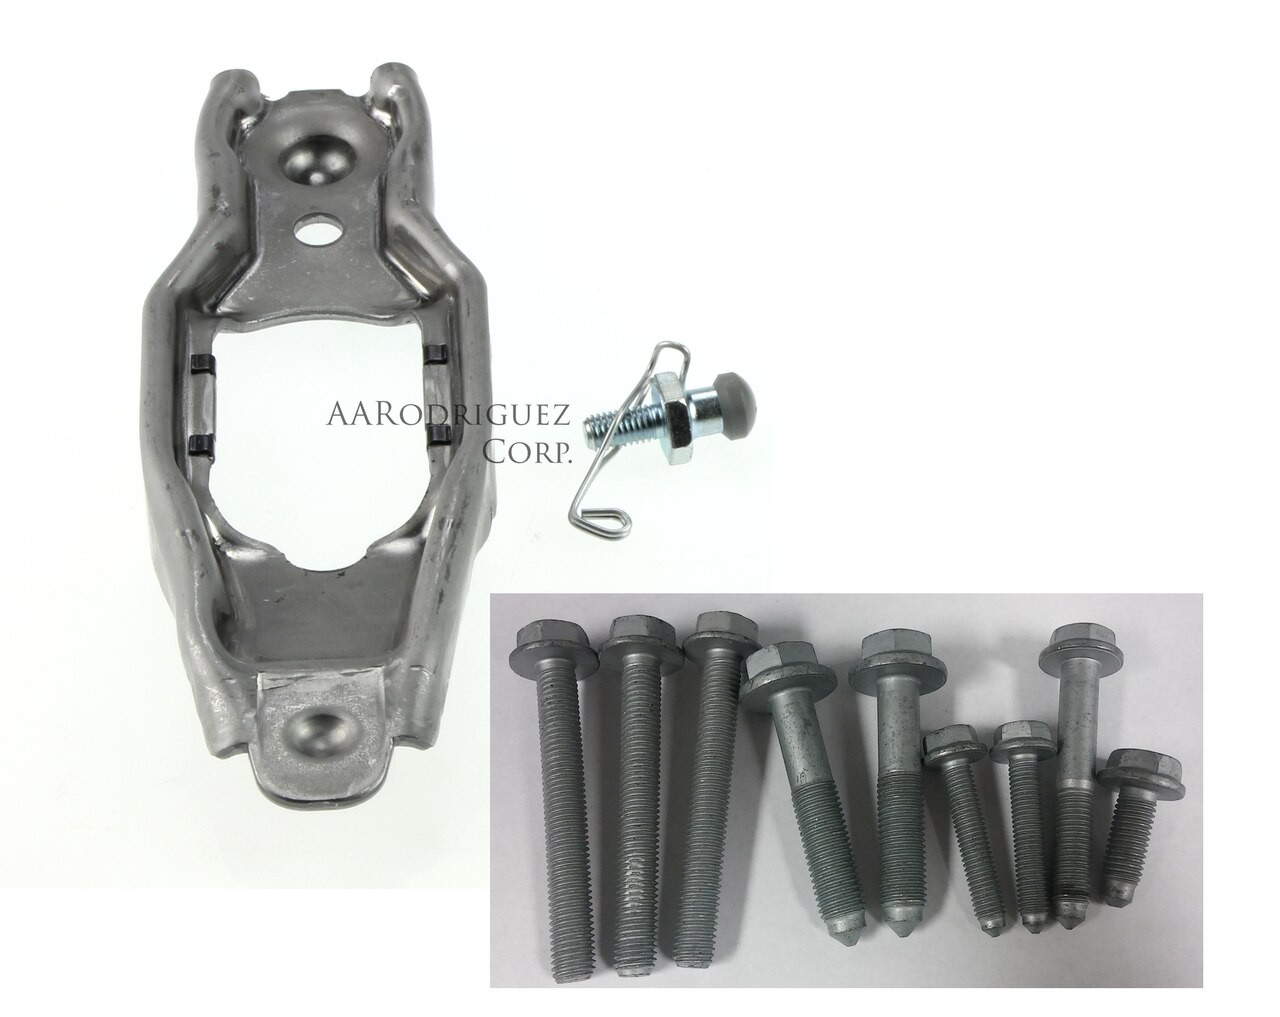 DKM MA-Series 5 Speed TDI Complete Clutch Kit (AAR2562)